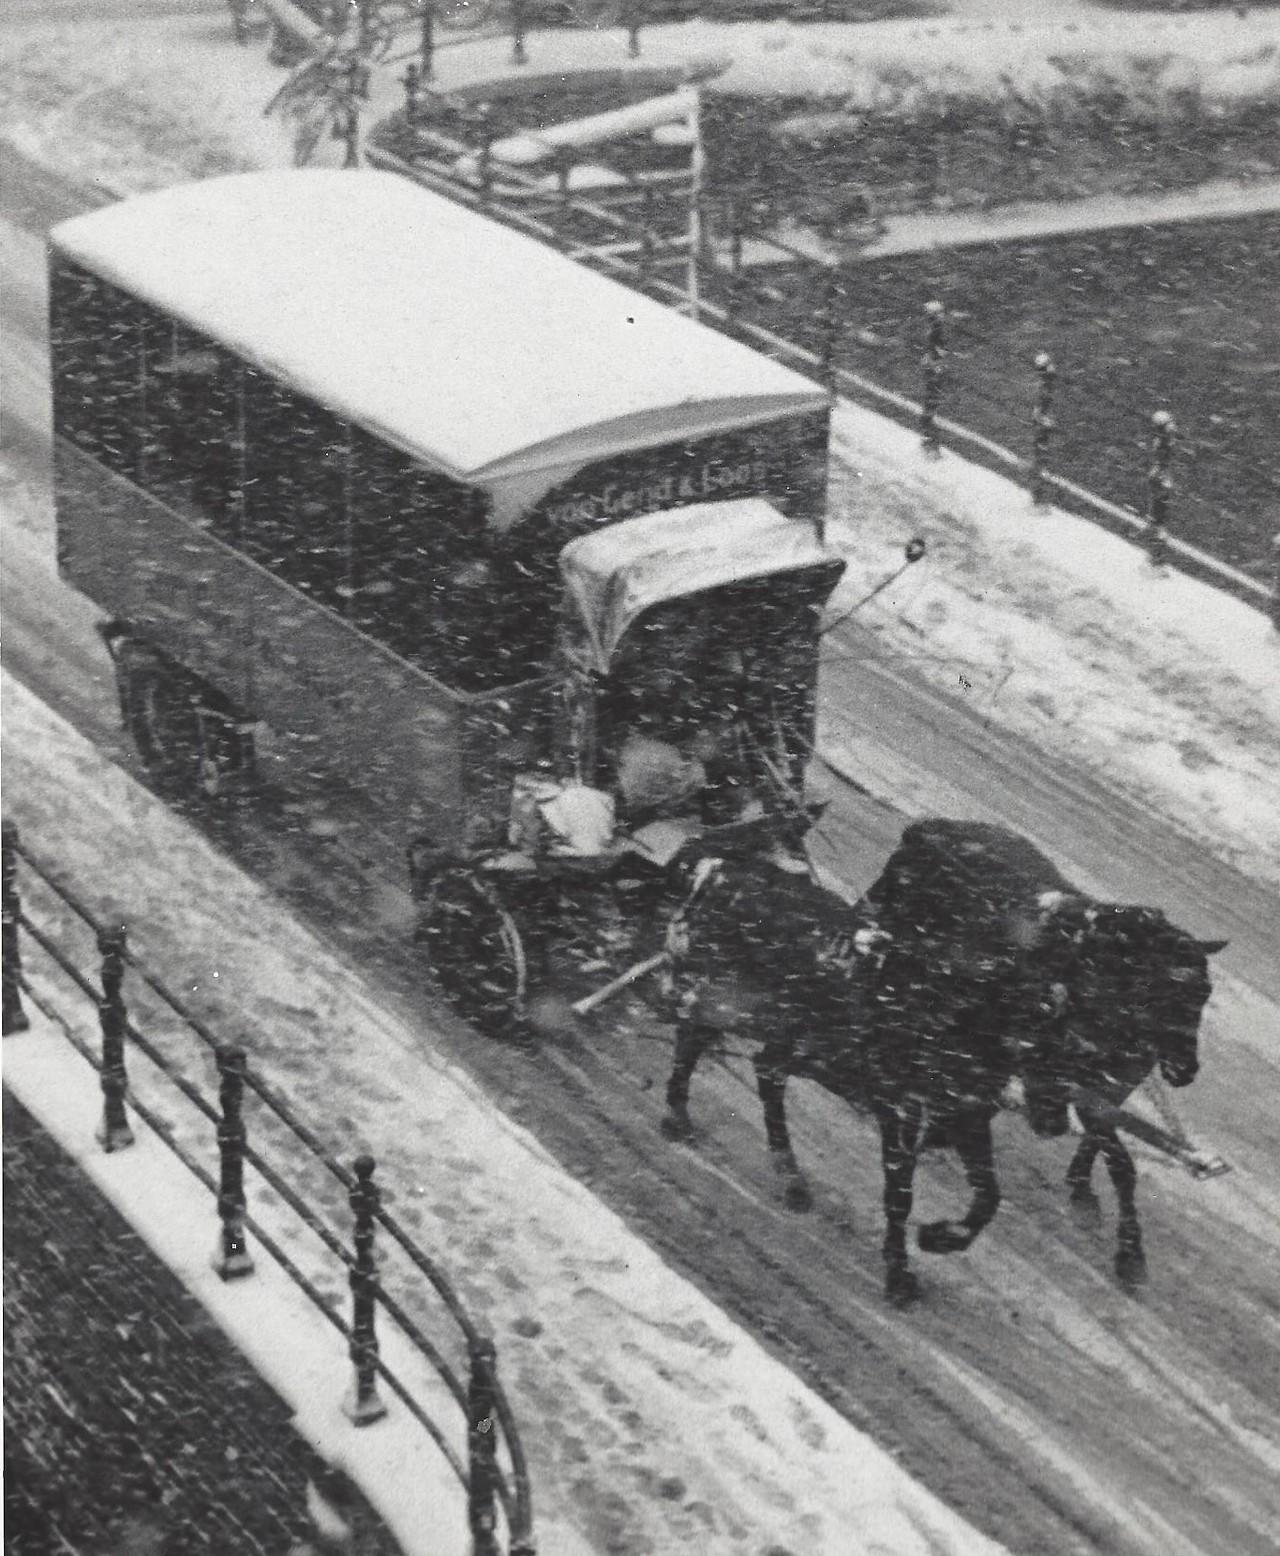 Амстердам, январь 1956-го. Фотограф Кис Шерер